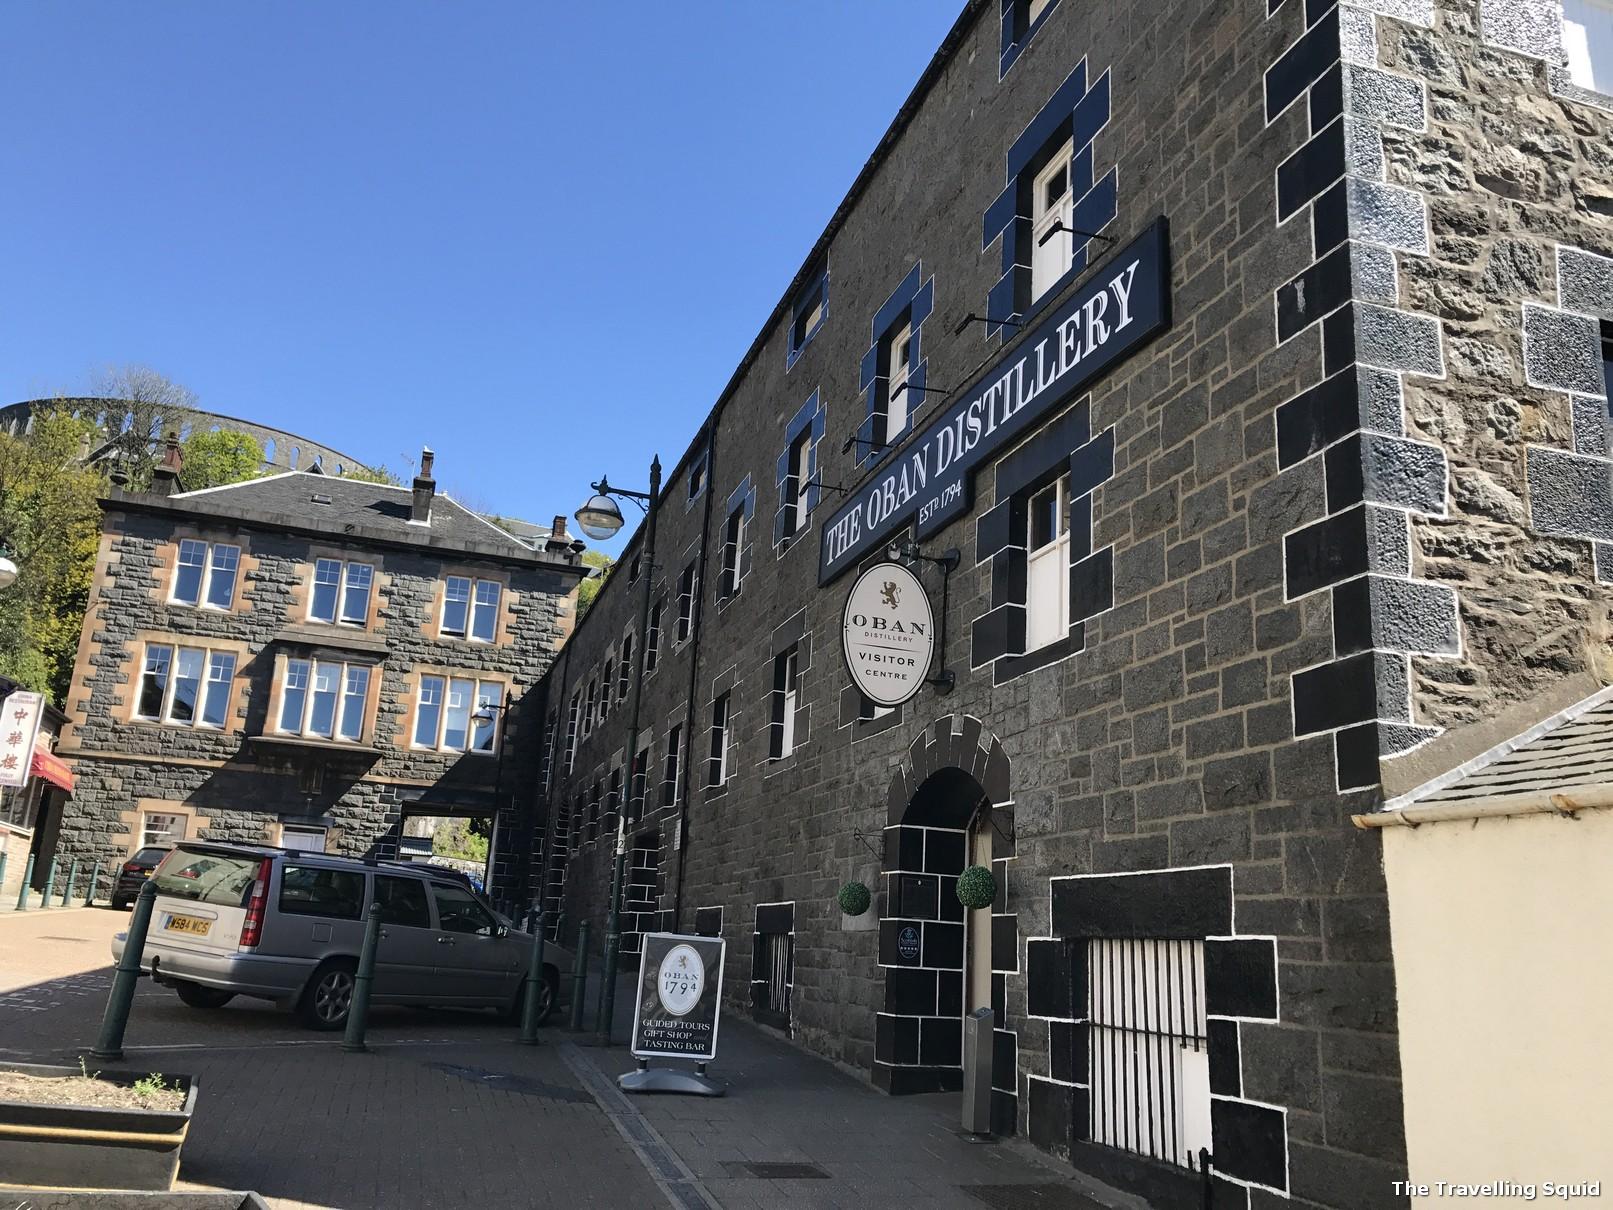 oban distillery tour scotch